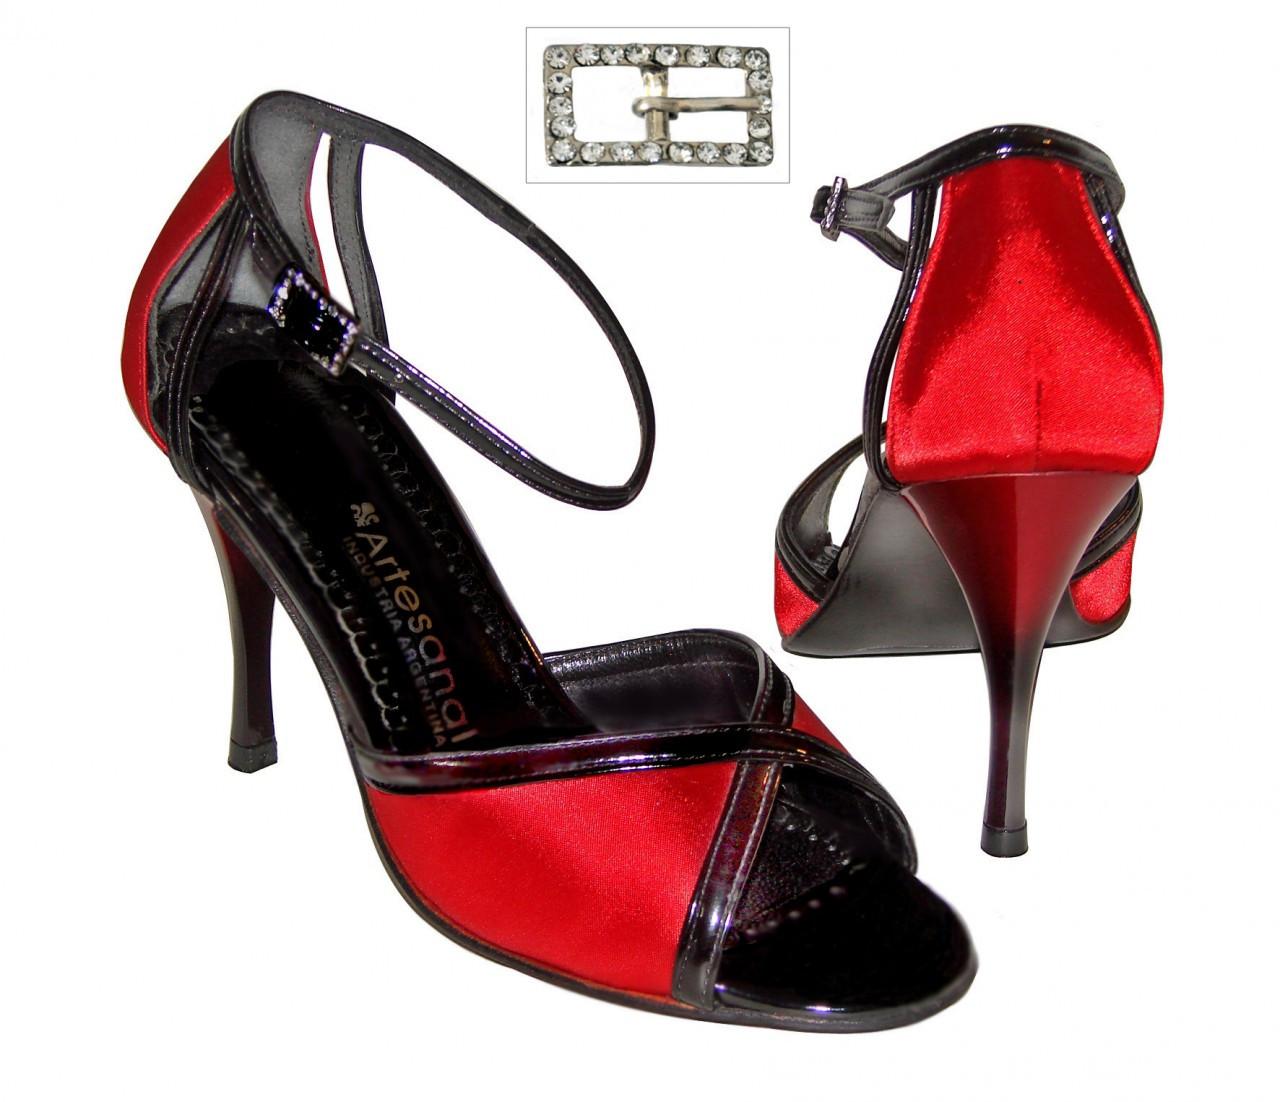 Tango Shoes - Artesanal - Margot